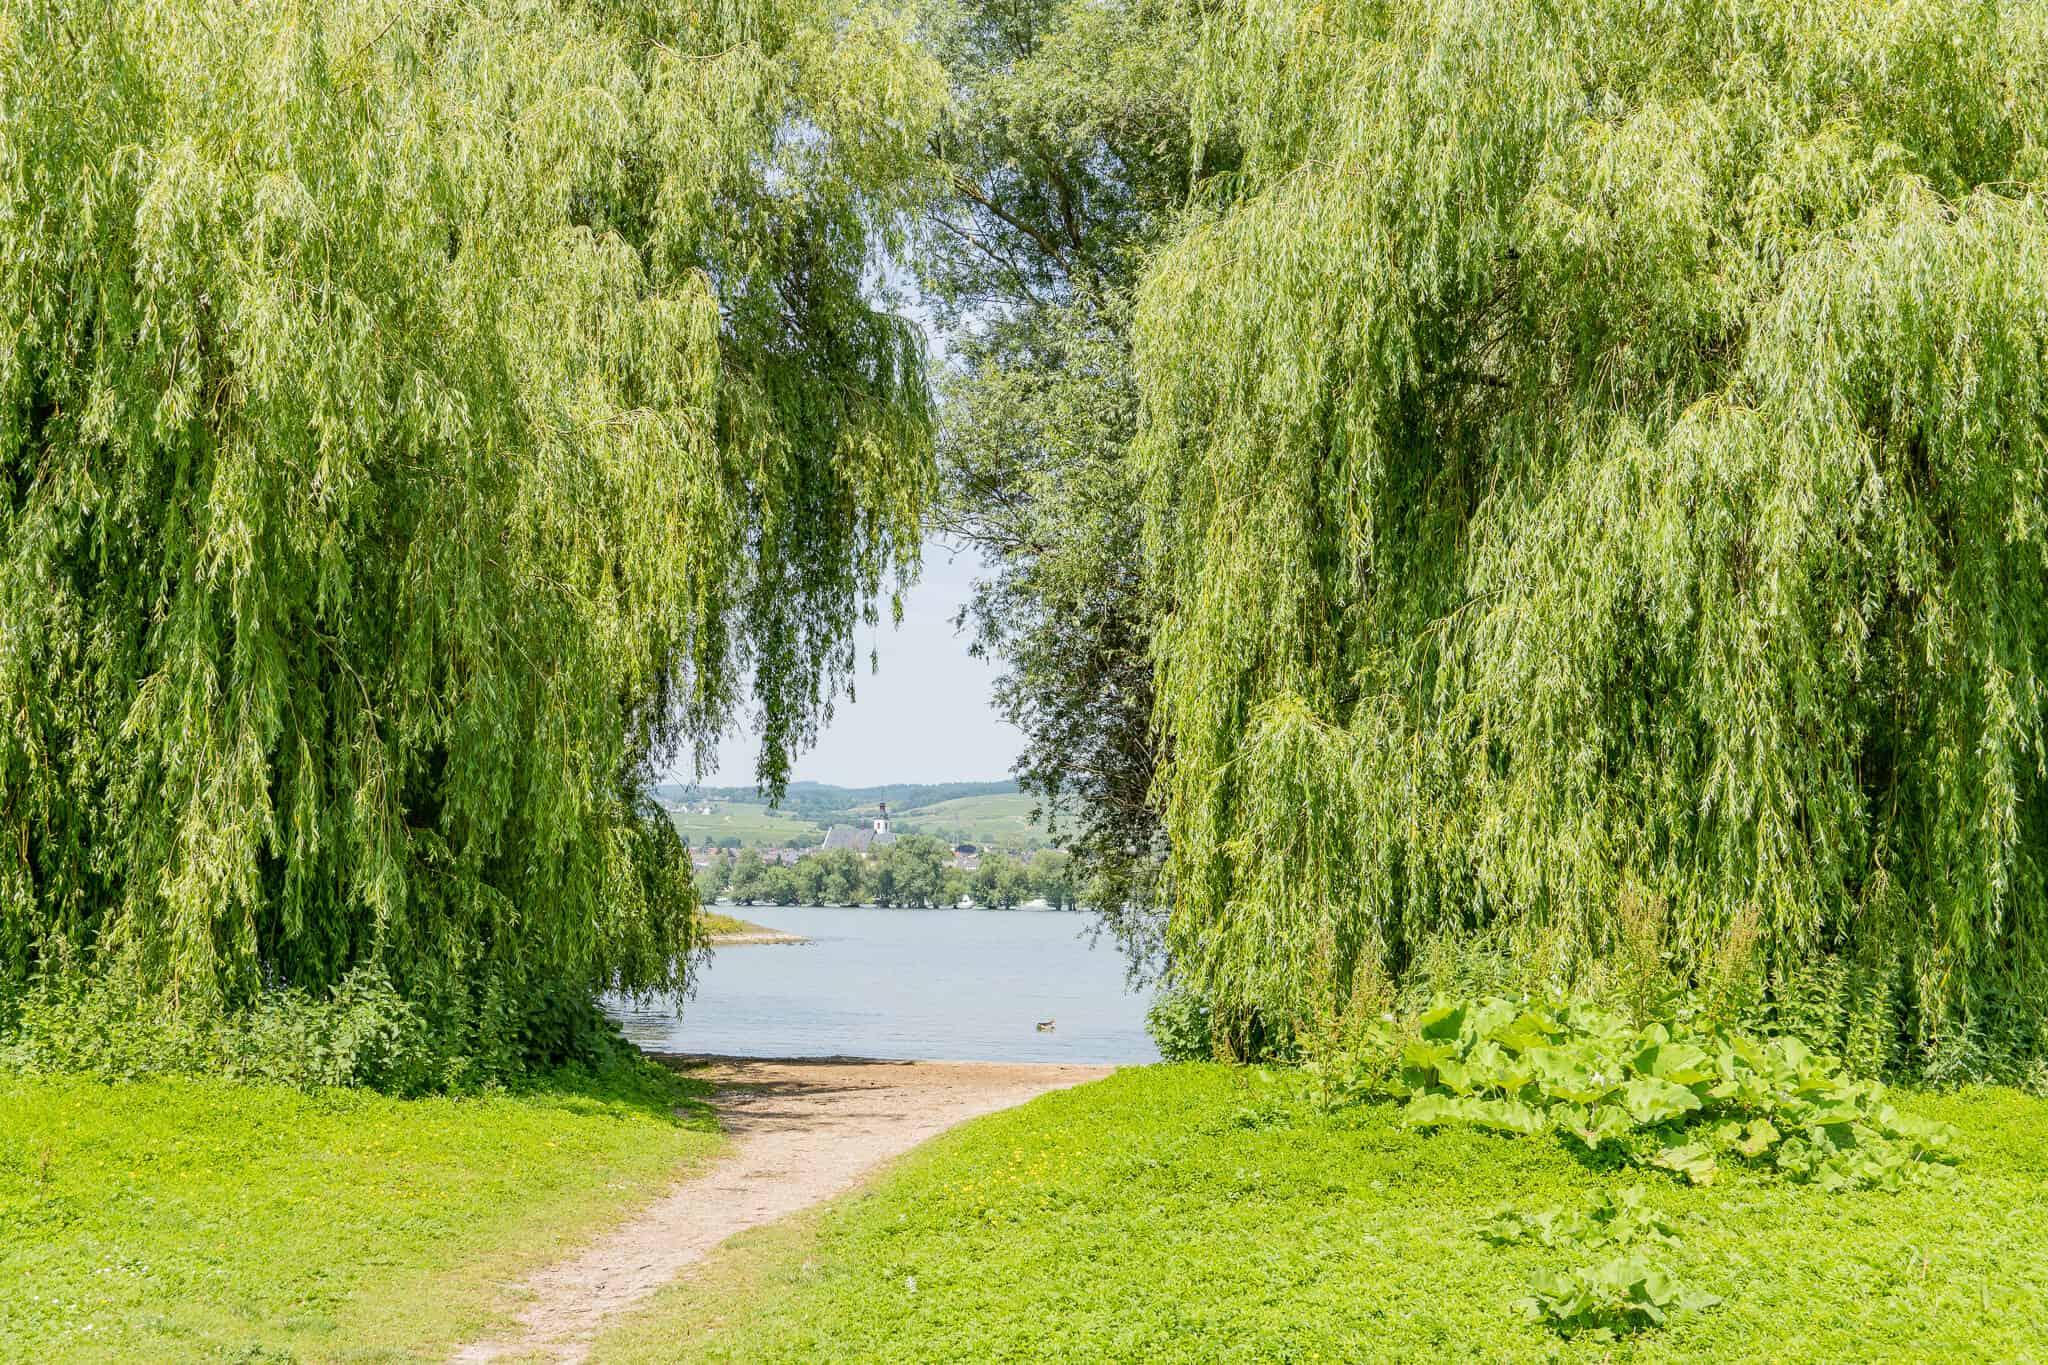 Rheinauen Blick auf den Rhein